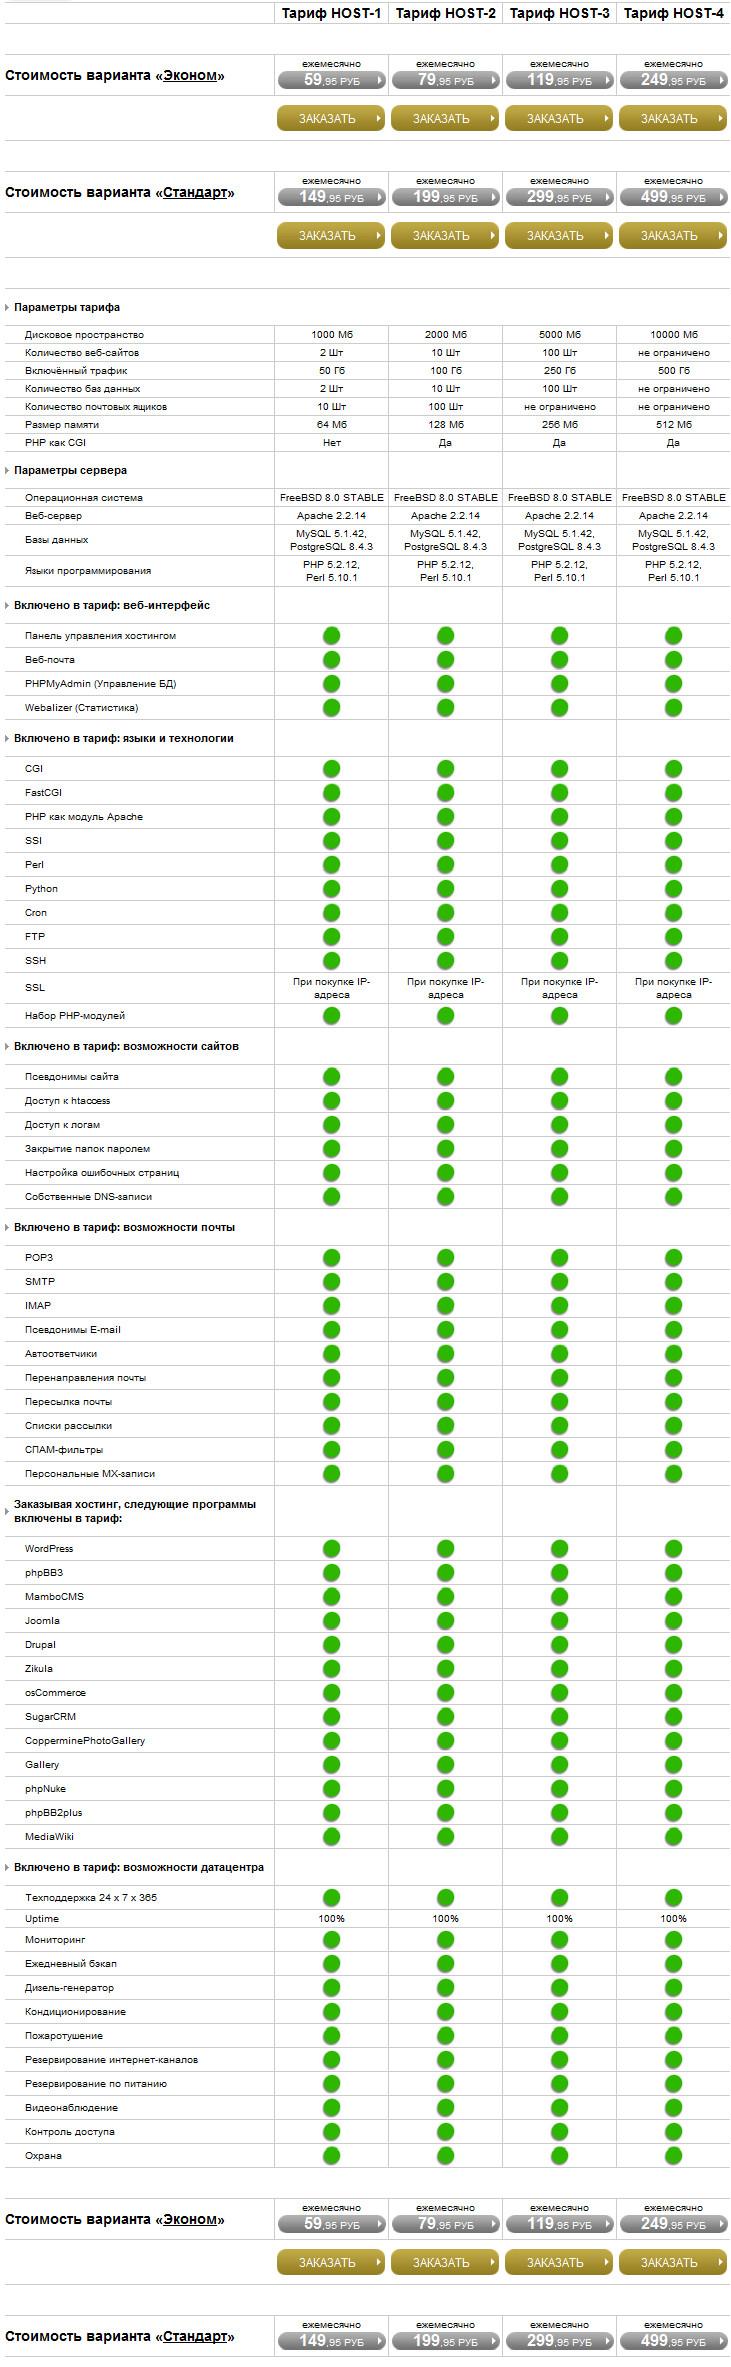 RadiusHost. Сравнительная таблица тарифов виртуального хостинга